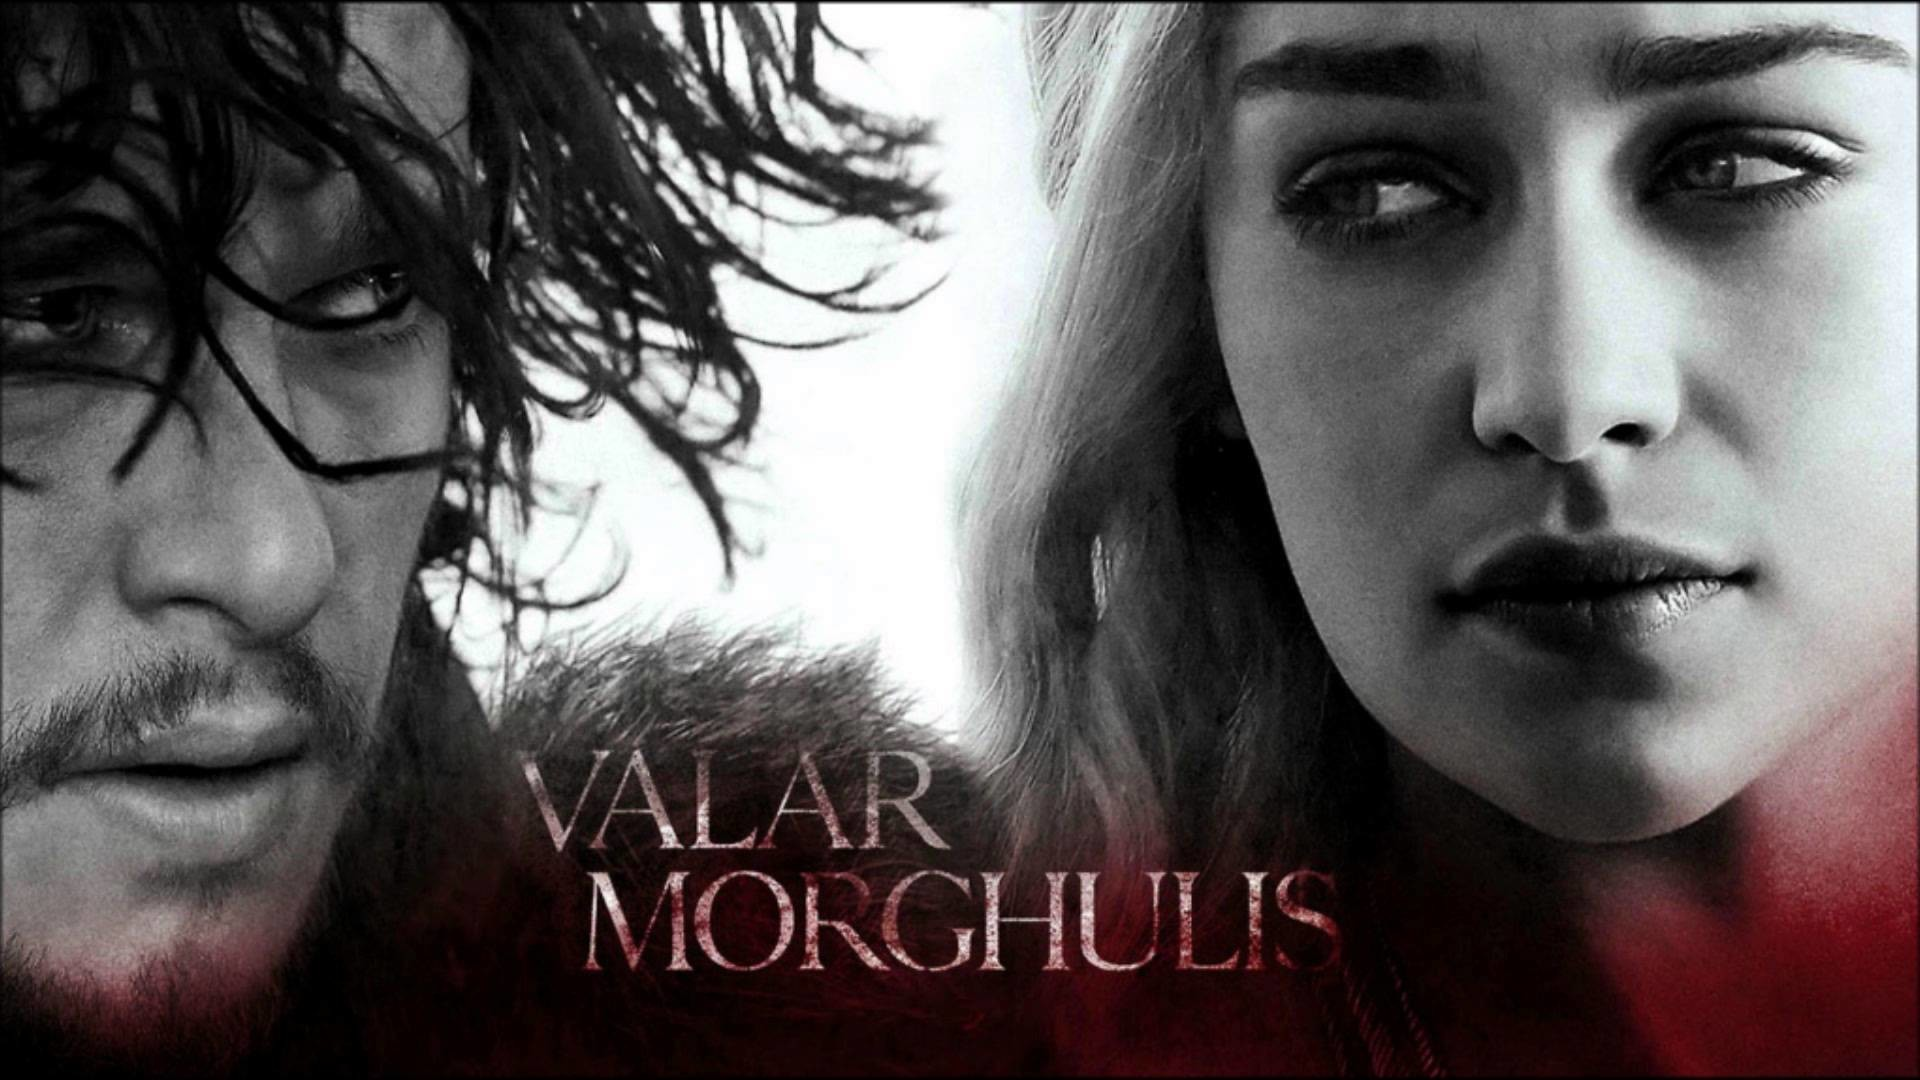 Game Of Thrones Season 6 Wallpapers: Emilia Clarke Game Of Thrones Wallpapers (71+ Images